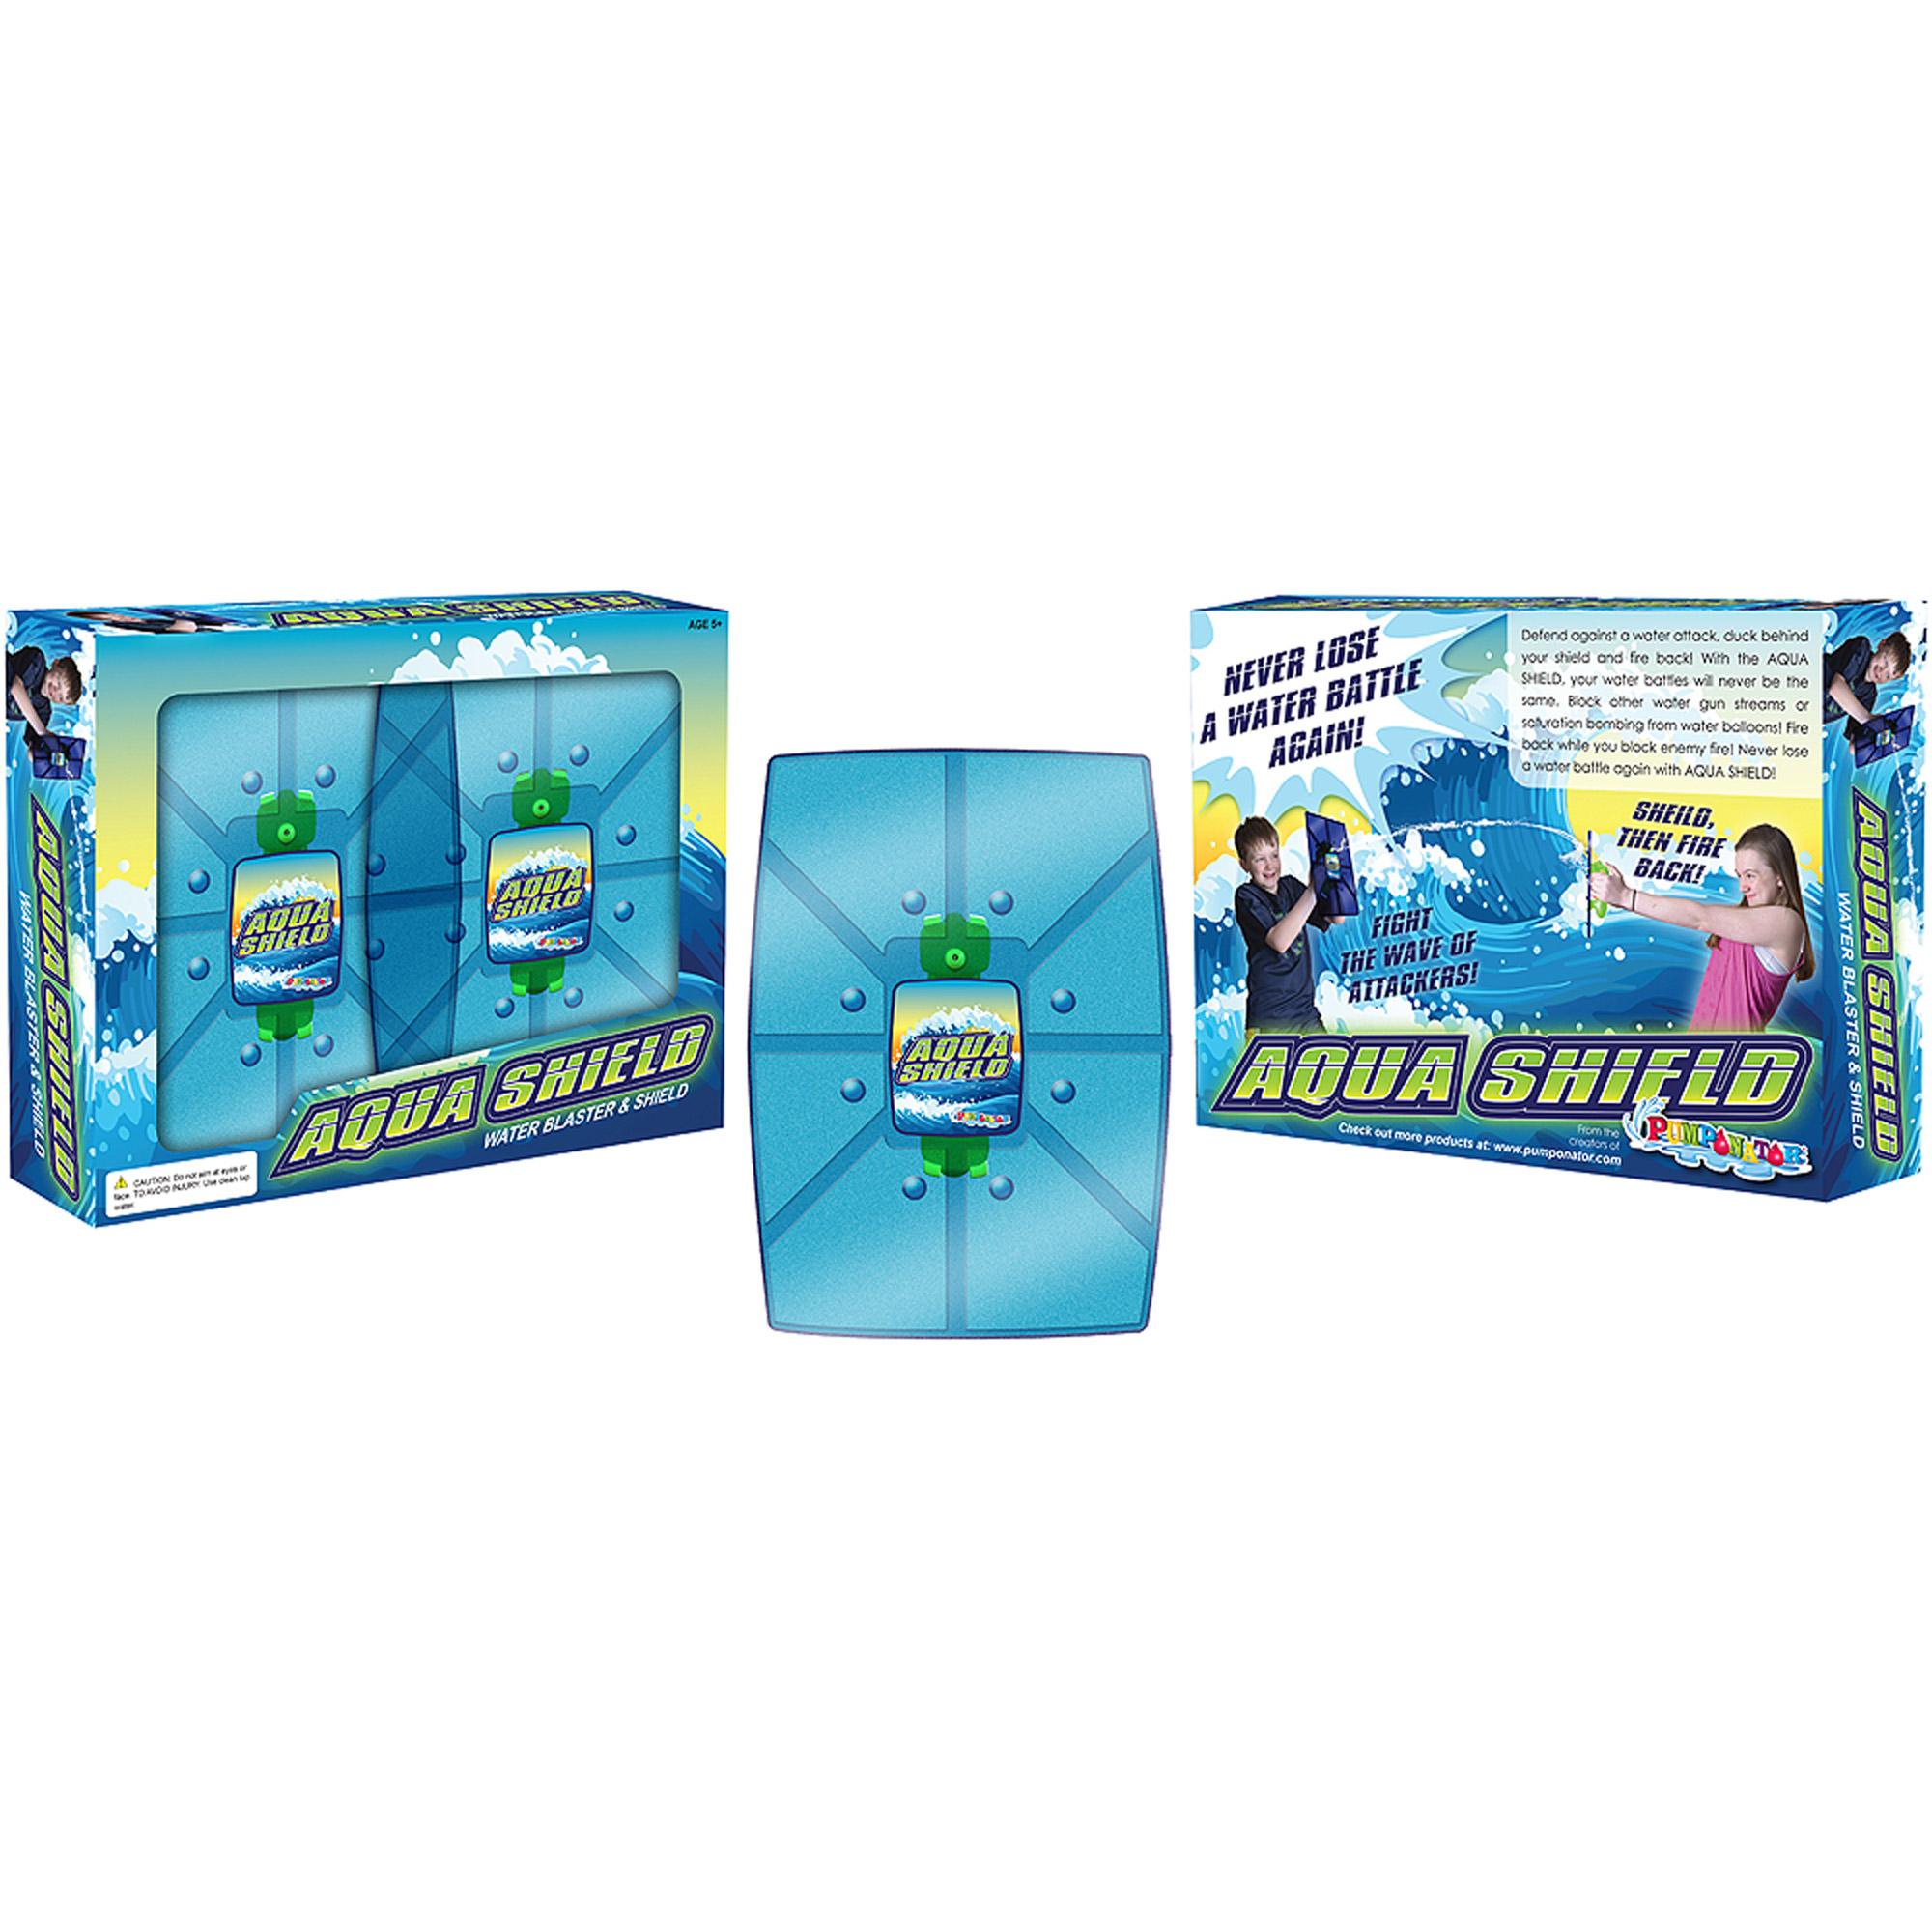 Pumponator 2 Aqua Shield Water-Squirting Shields